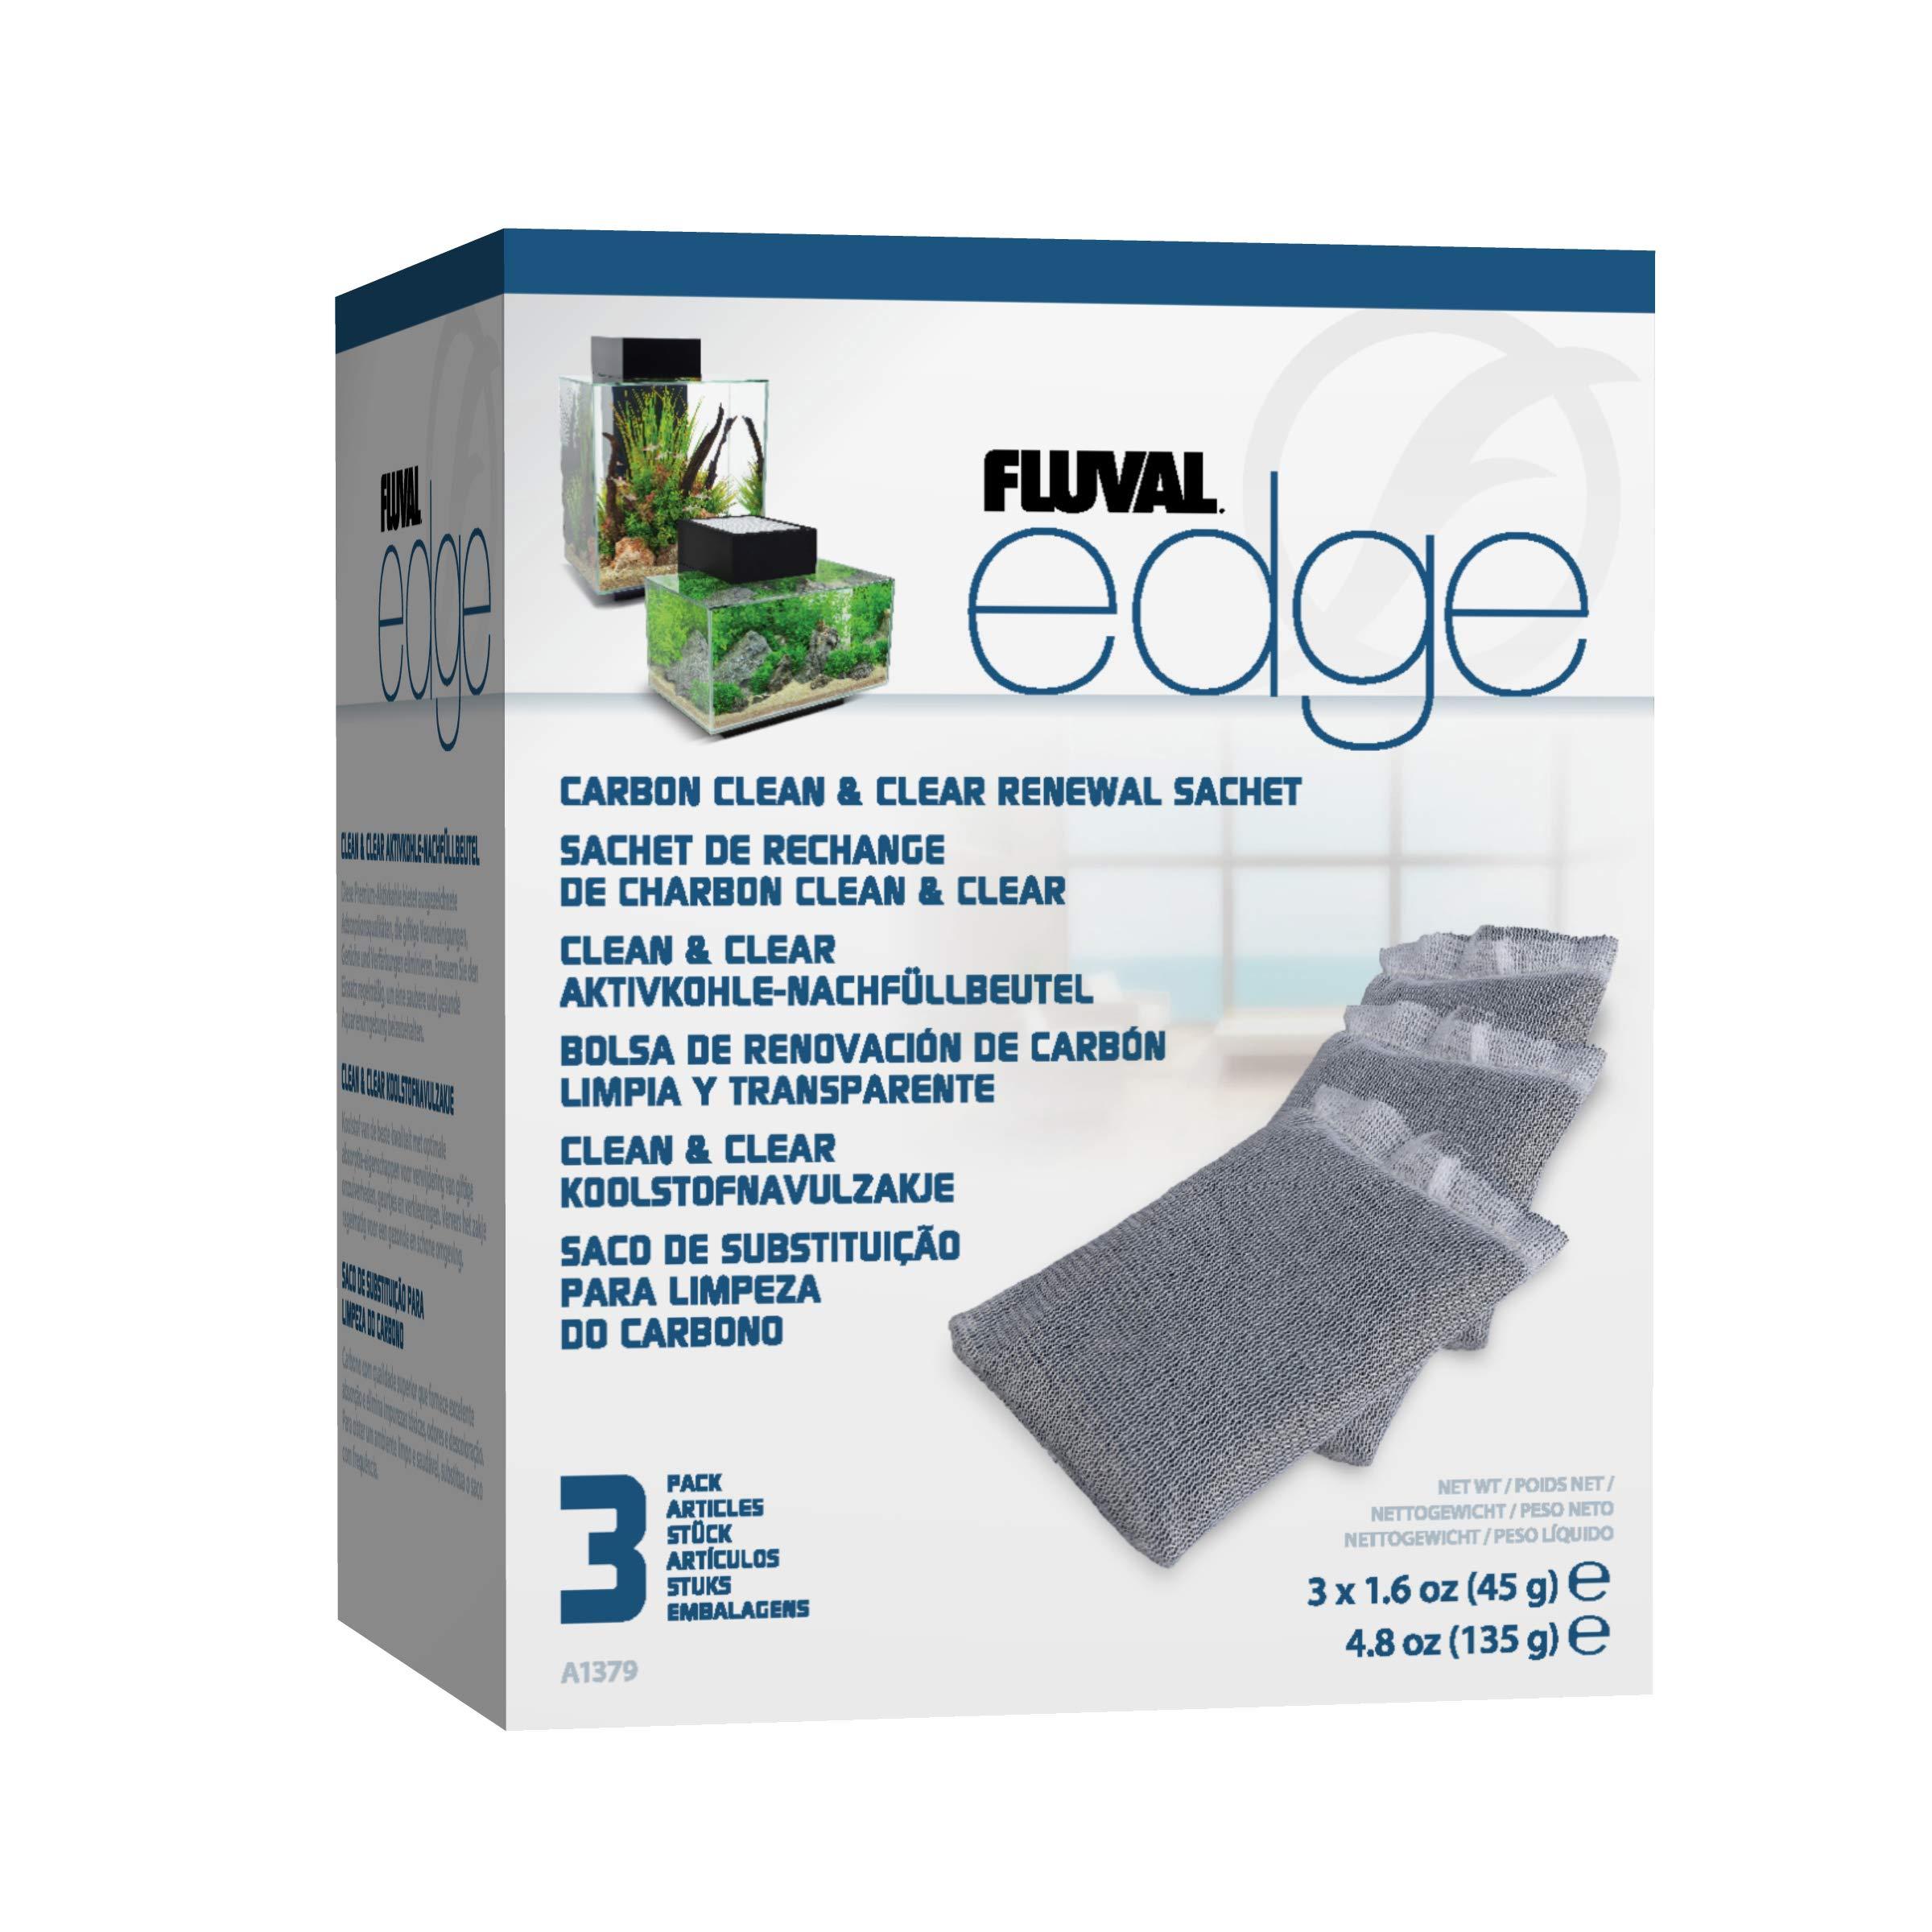 Fluval EDGE Carbon Clean & Clear Renewal Sachets - 3-Pack